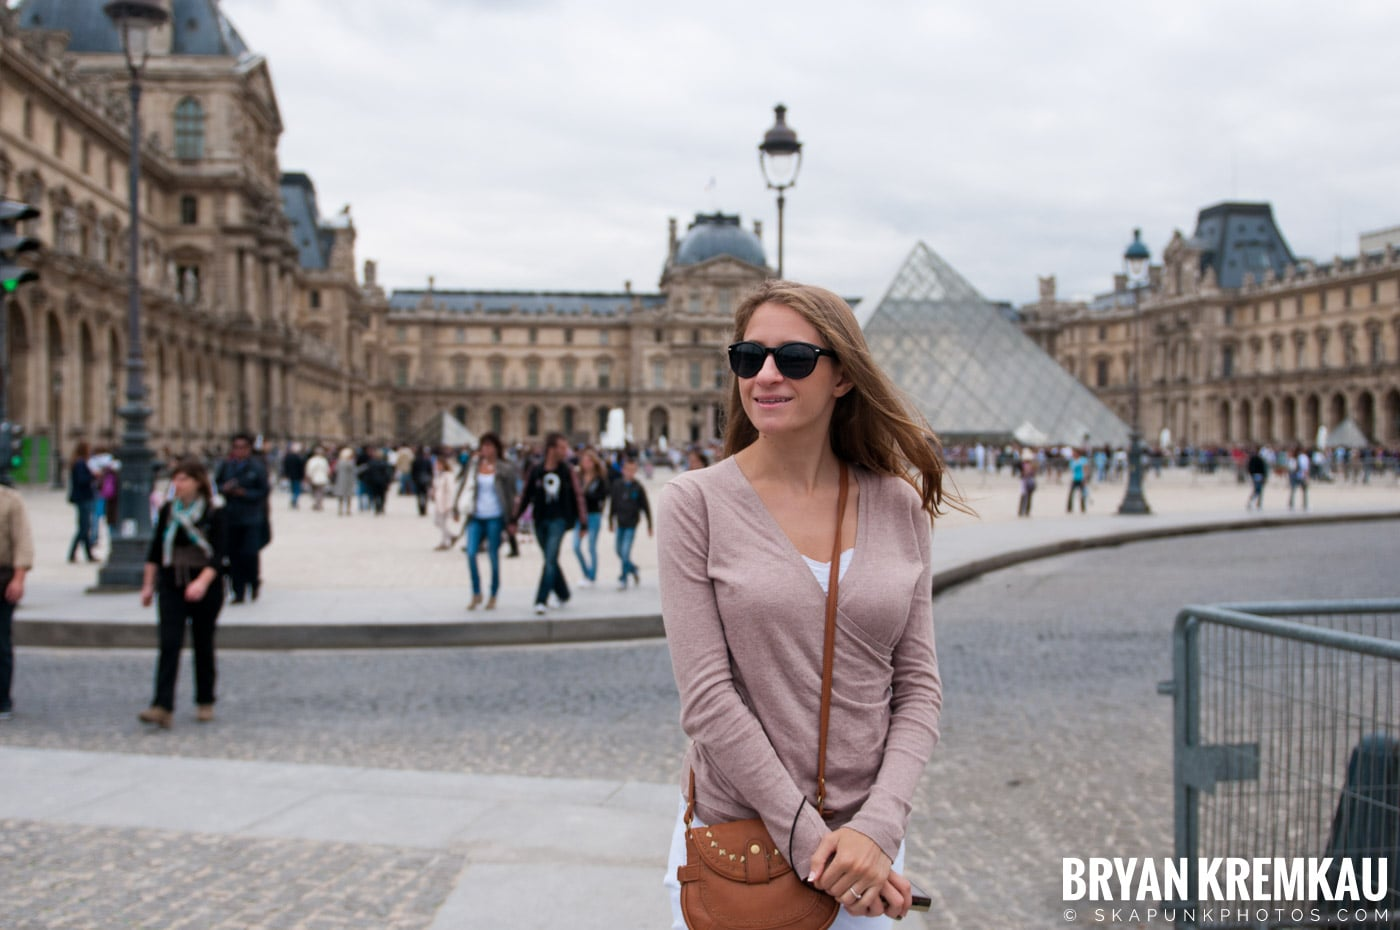 Paris, France Honeymoon - Day 3 - 7.20.11 (47)